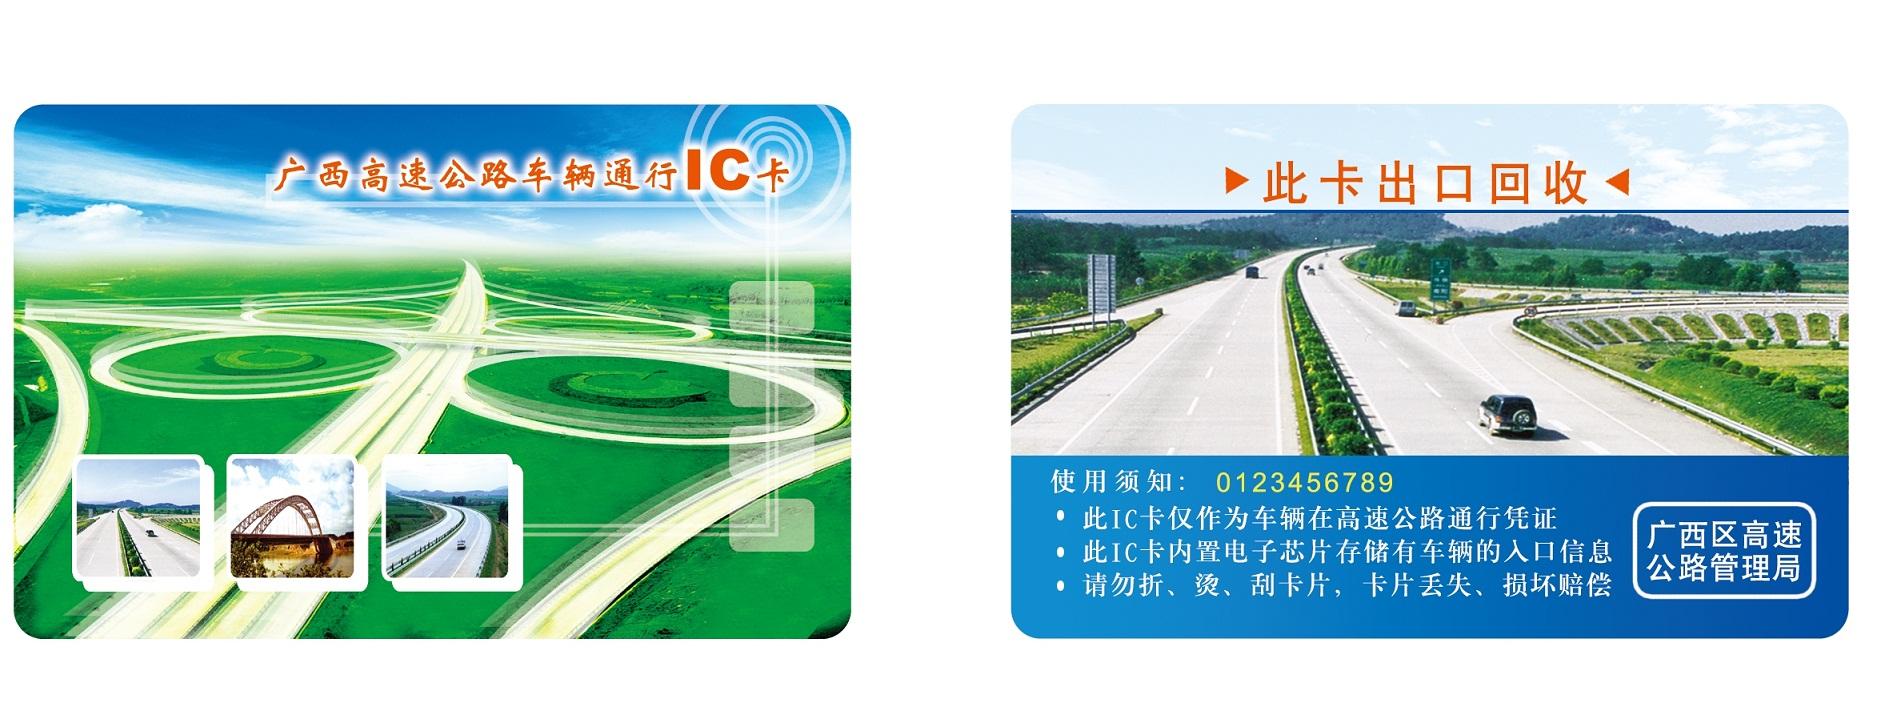 交通ETC卡